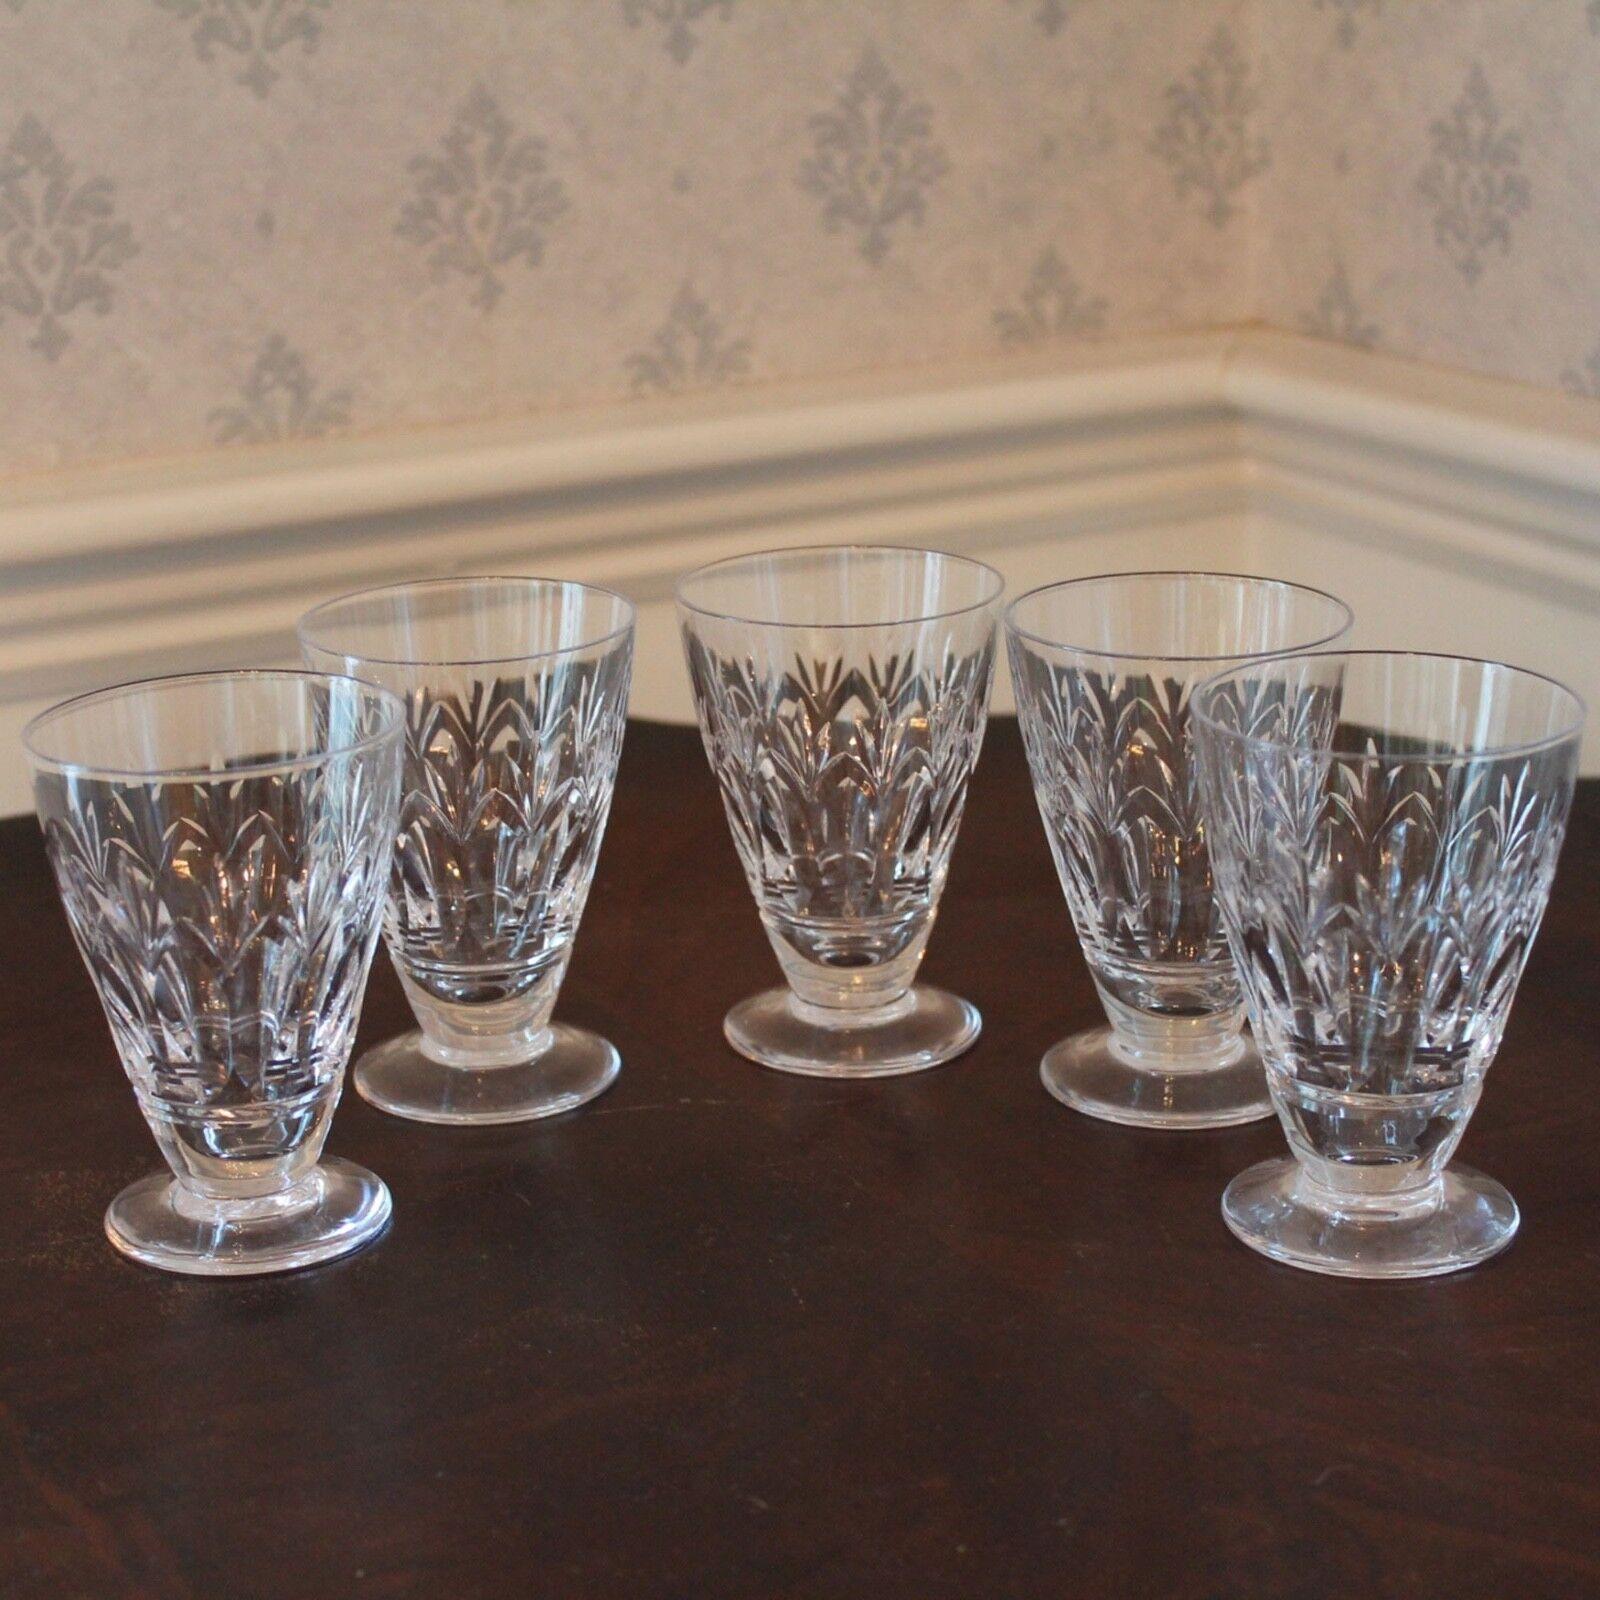 Vintage Set of 5 Stuart English Crystal Juice Glasses in the Cardinal Pattern